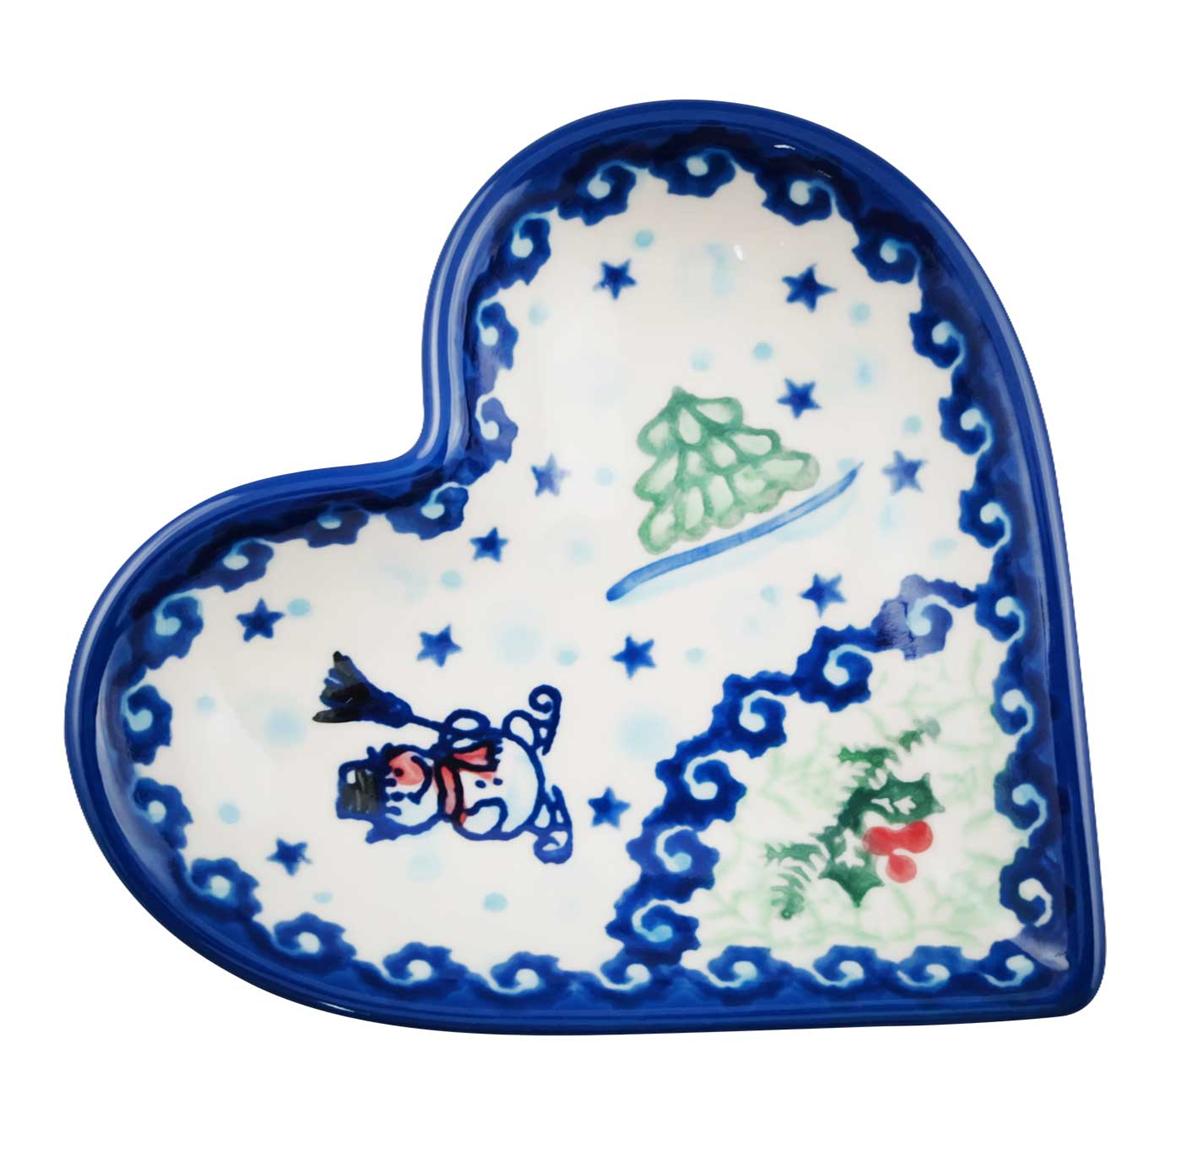 Pottery Avenue Stoneware Heart Plate - V392-A231 SNOWMAN UNIKAT